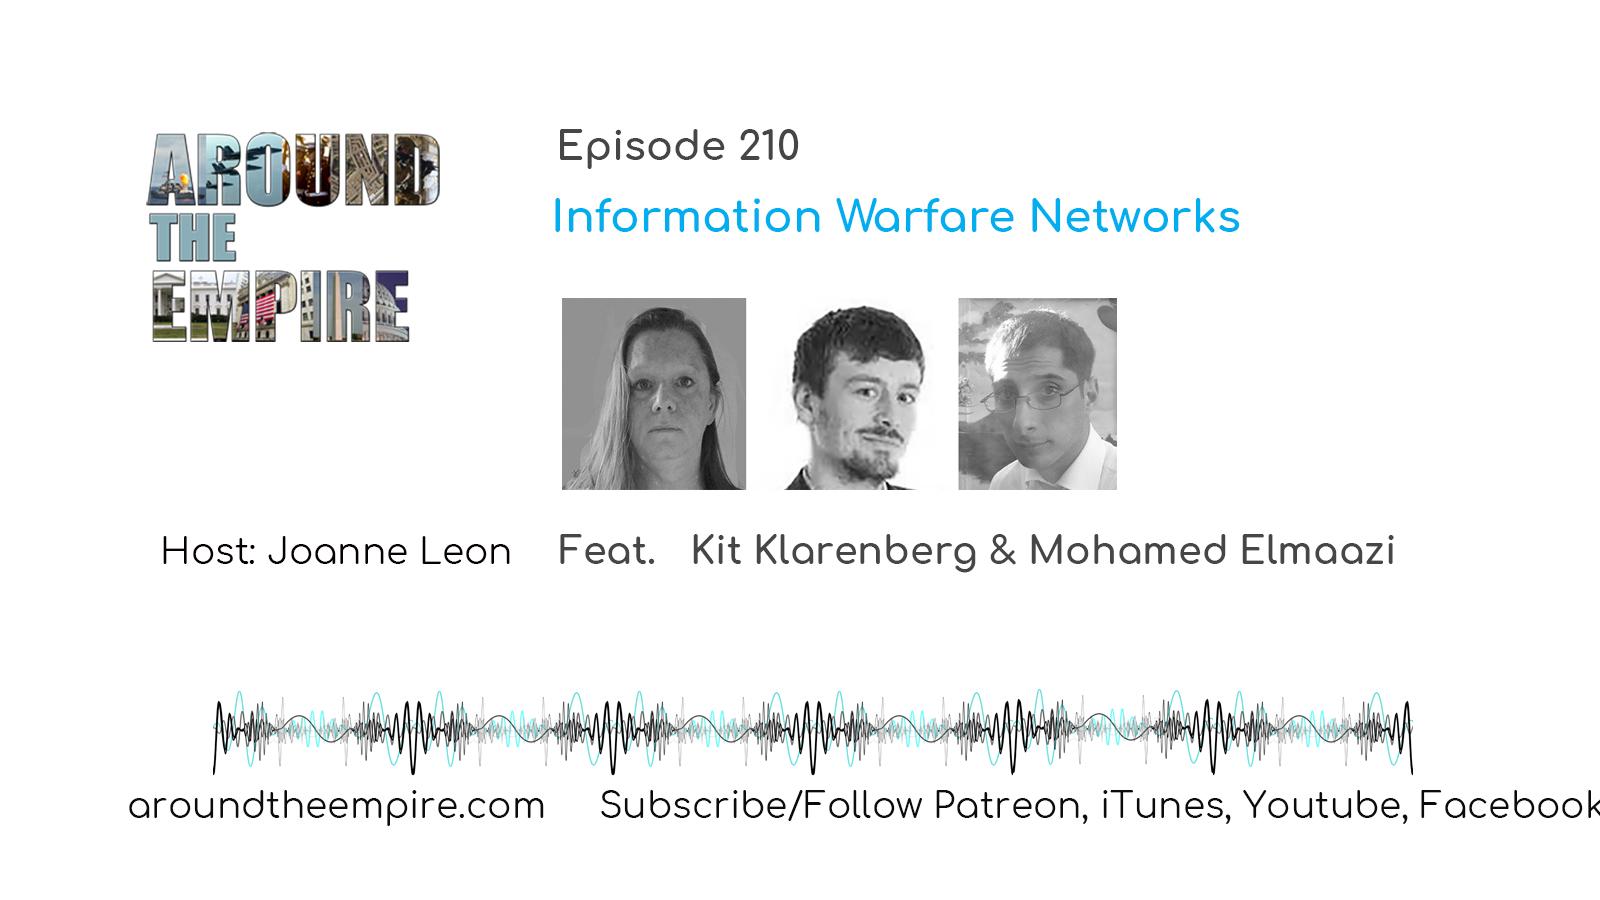 Ep 210 Information Warfare Networks feat Kit Klarenberg & Mohamed Elmaazi